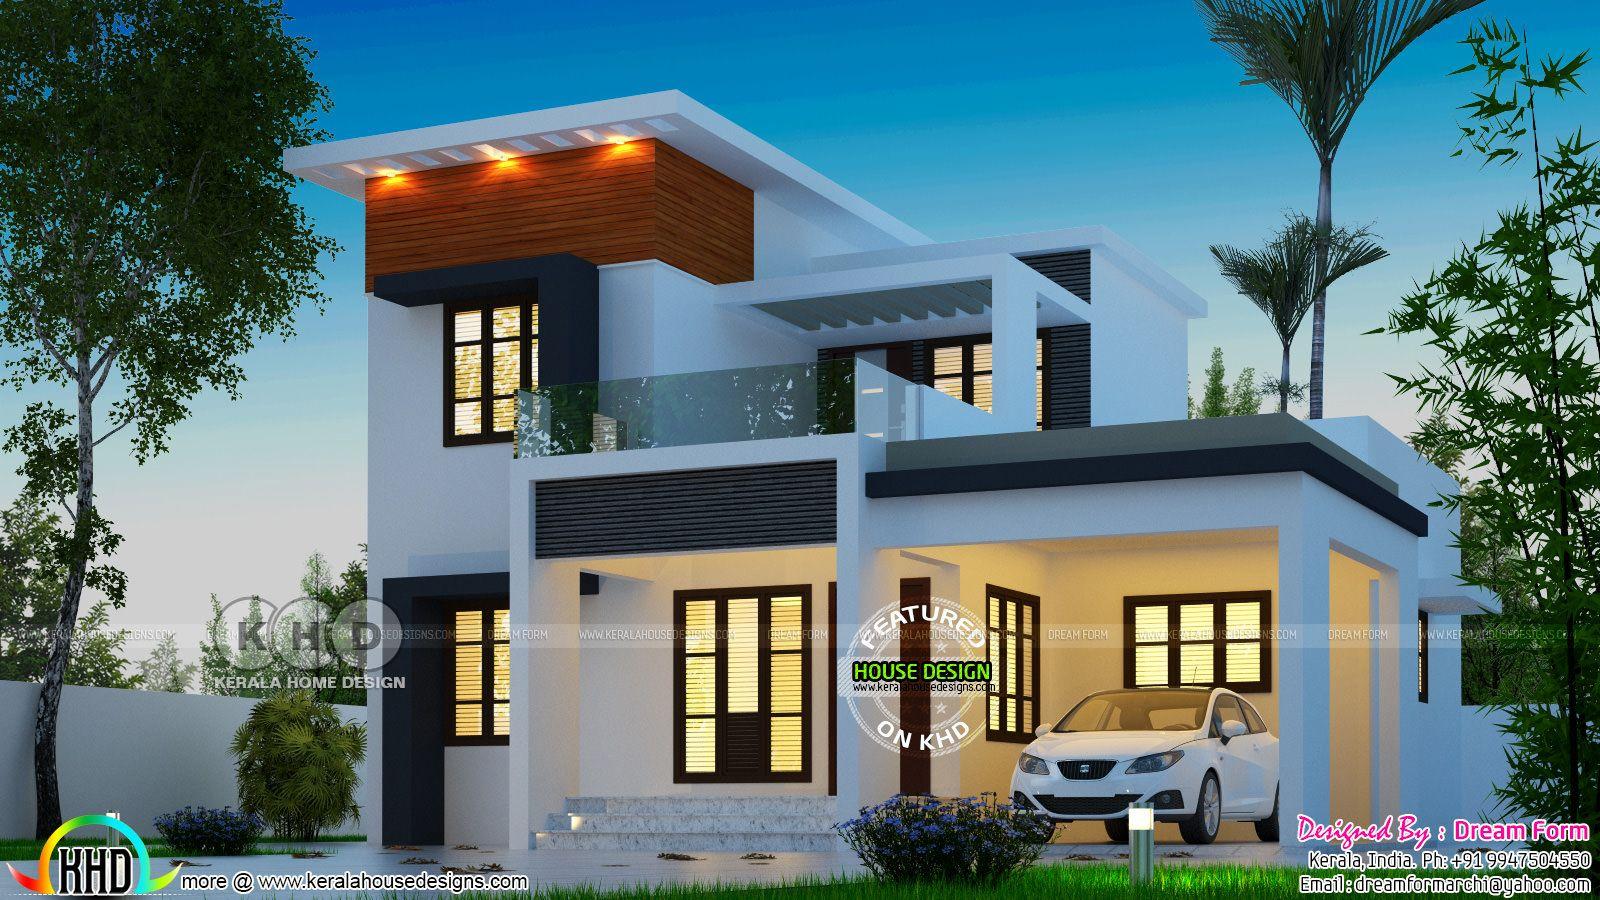 4 Bedroom Modern Beautiful Home Architecture 1628 Sq Ft Architecture House Modern Bedroom Kerala House Design